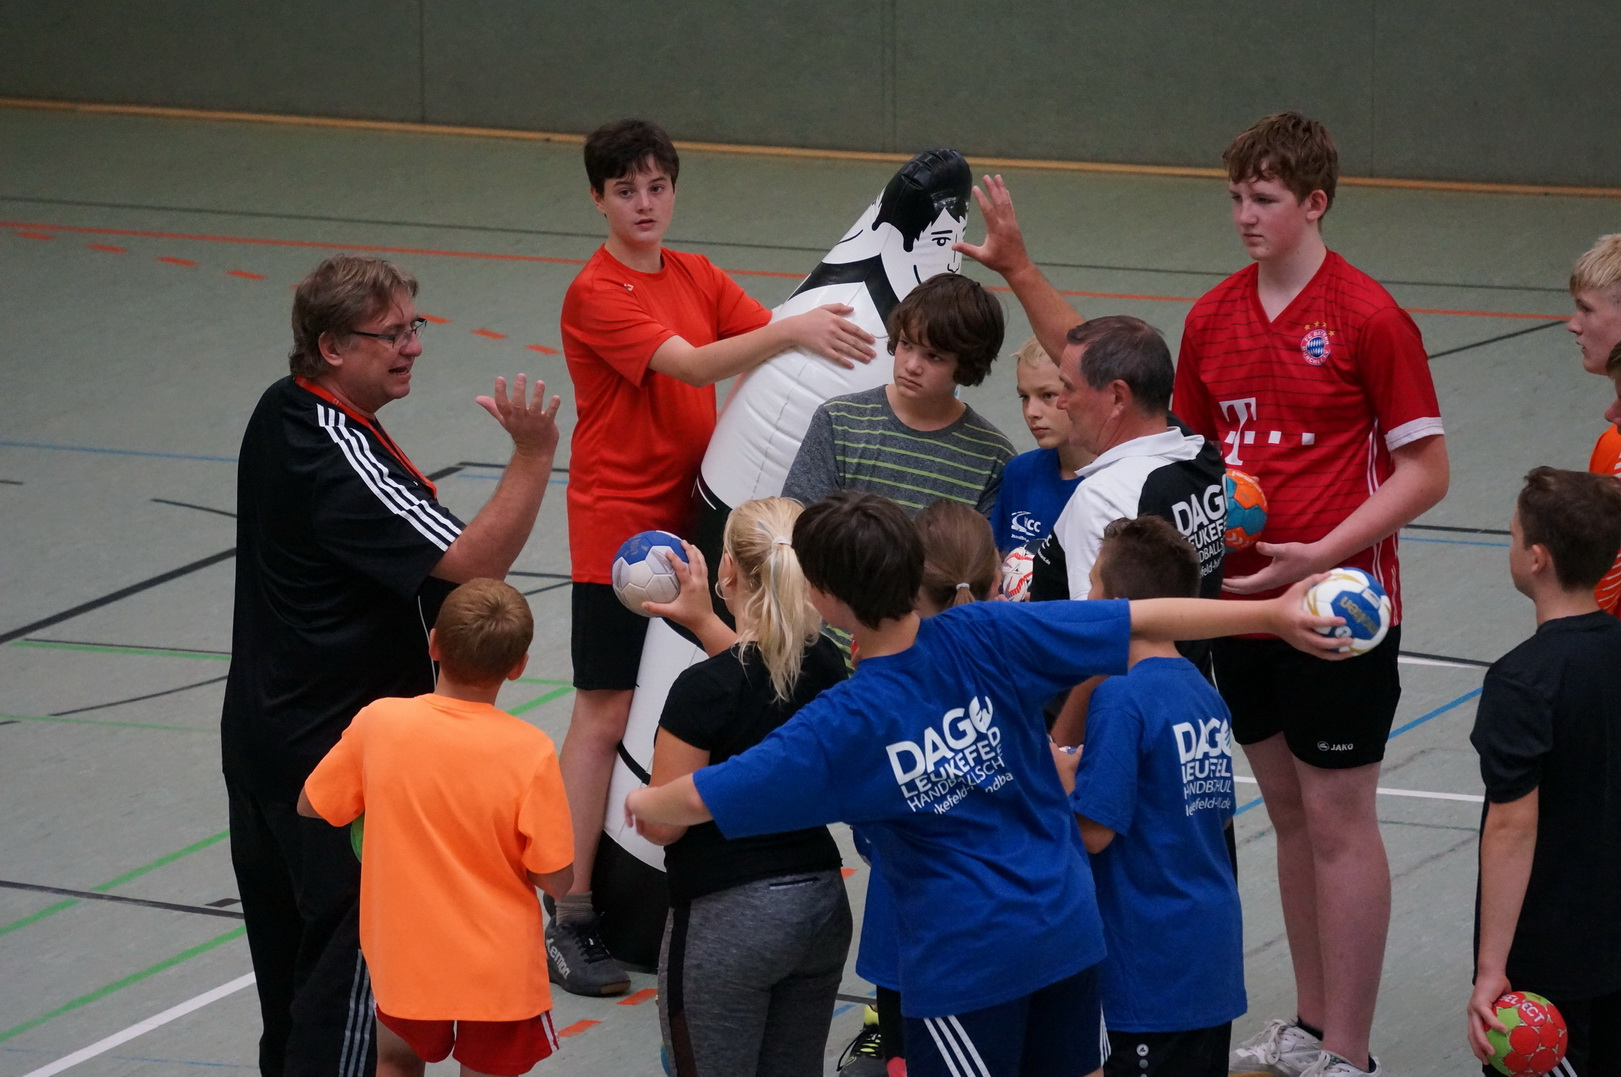 201808_Handballcamp_SDH_MG_233w